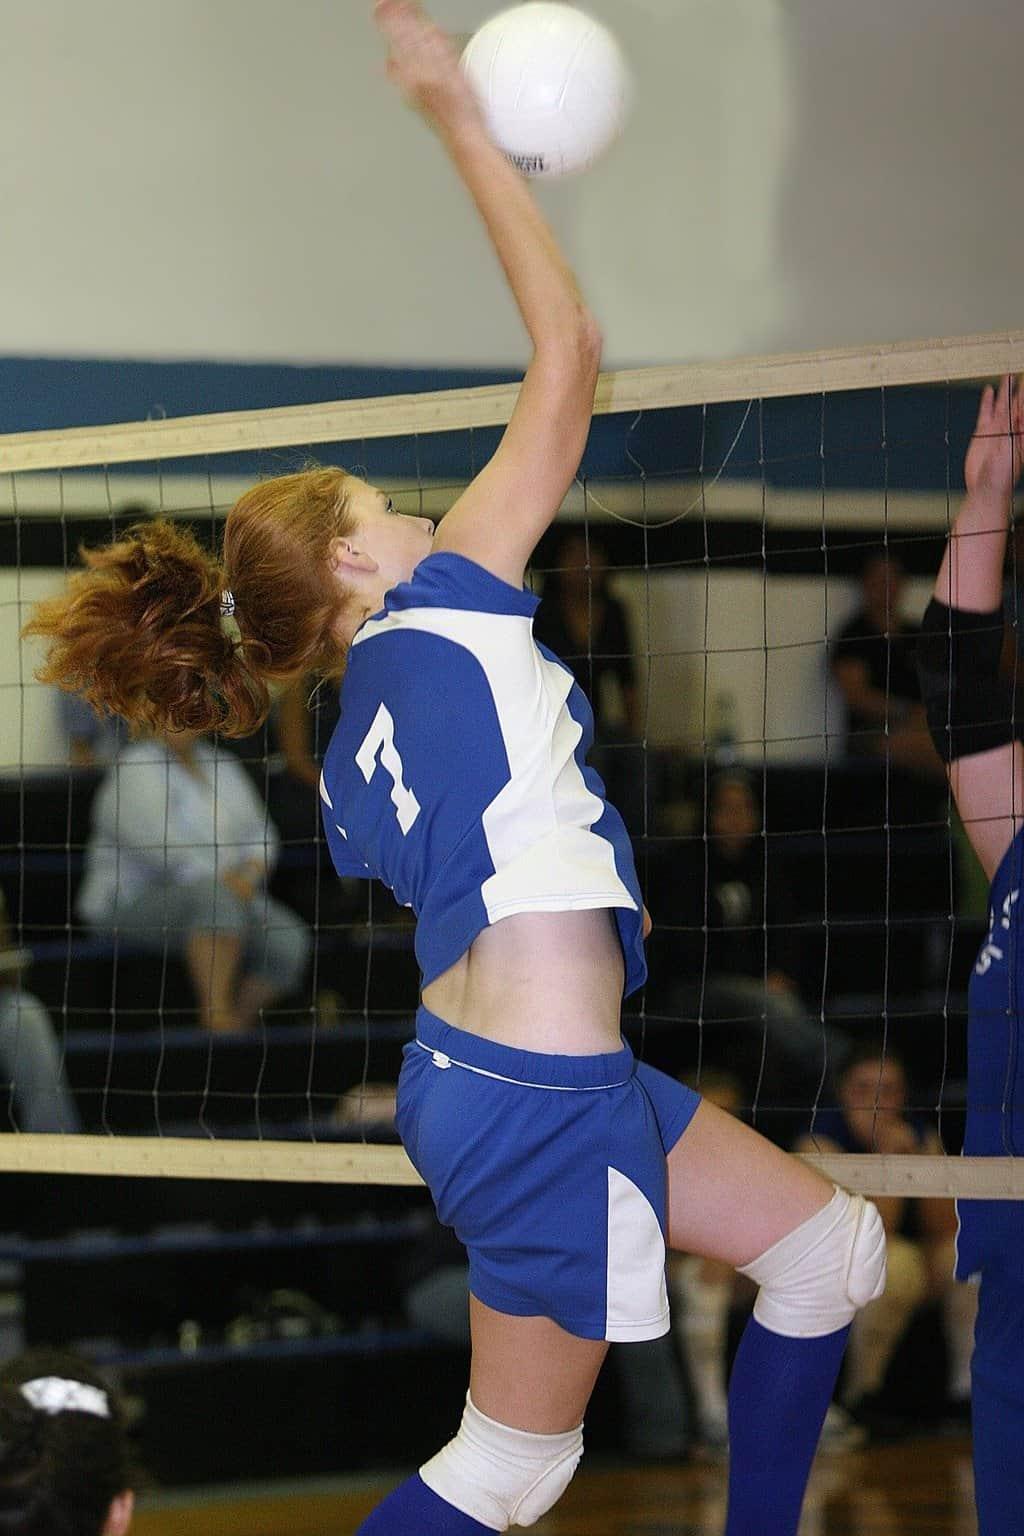 Volleyball player hitting a ball near the net